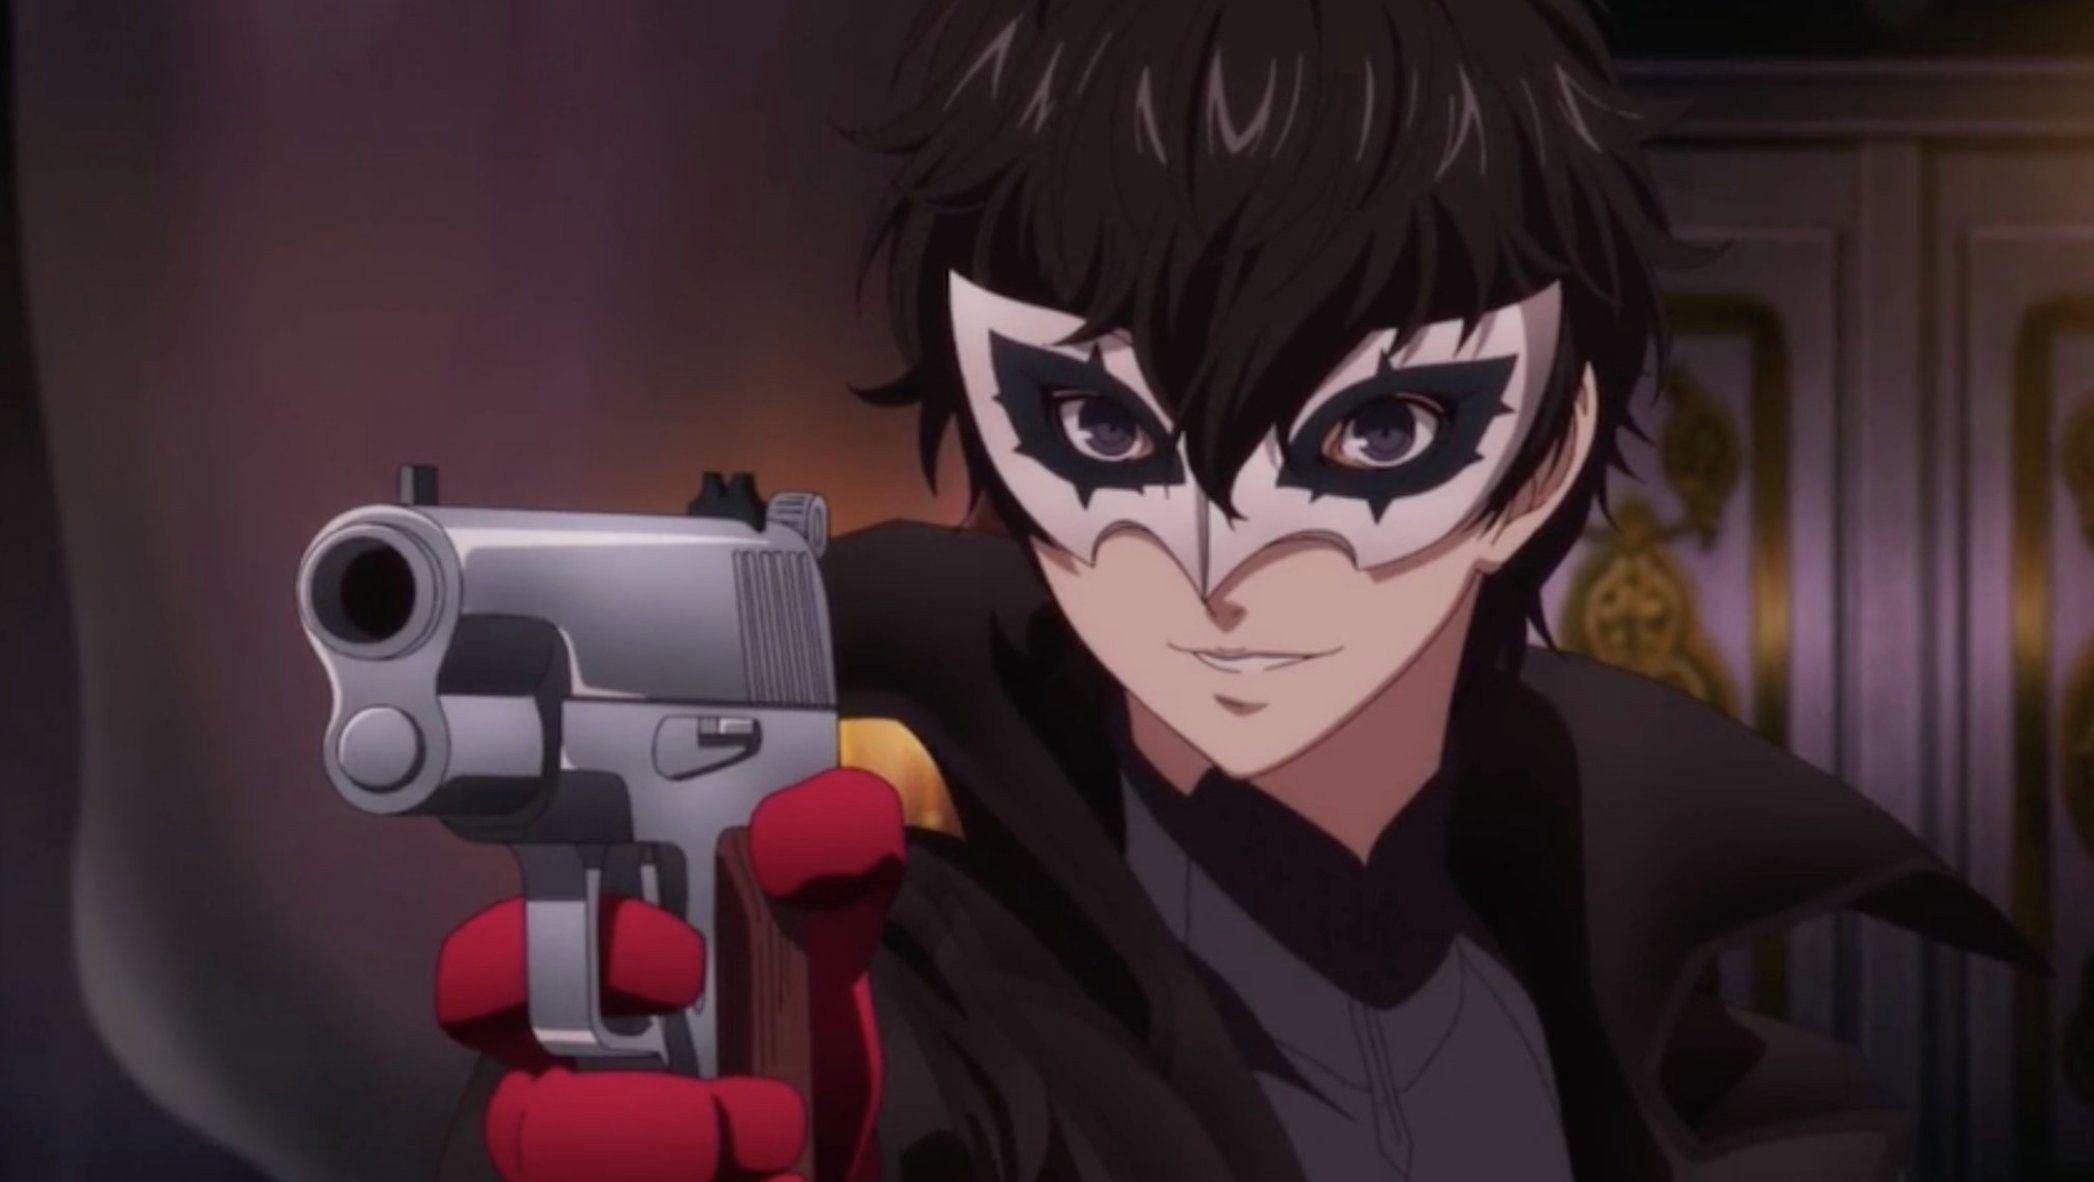 Ren Amamiya Joker Leader of Phantom Thieves